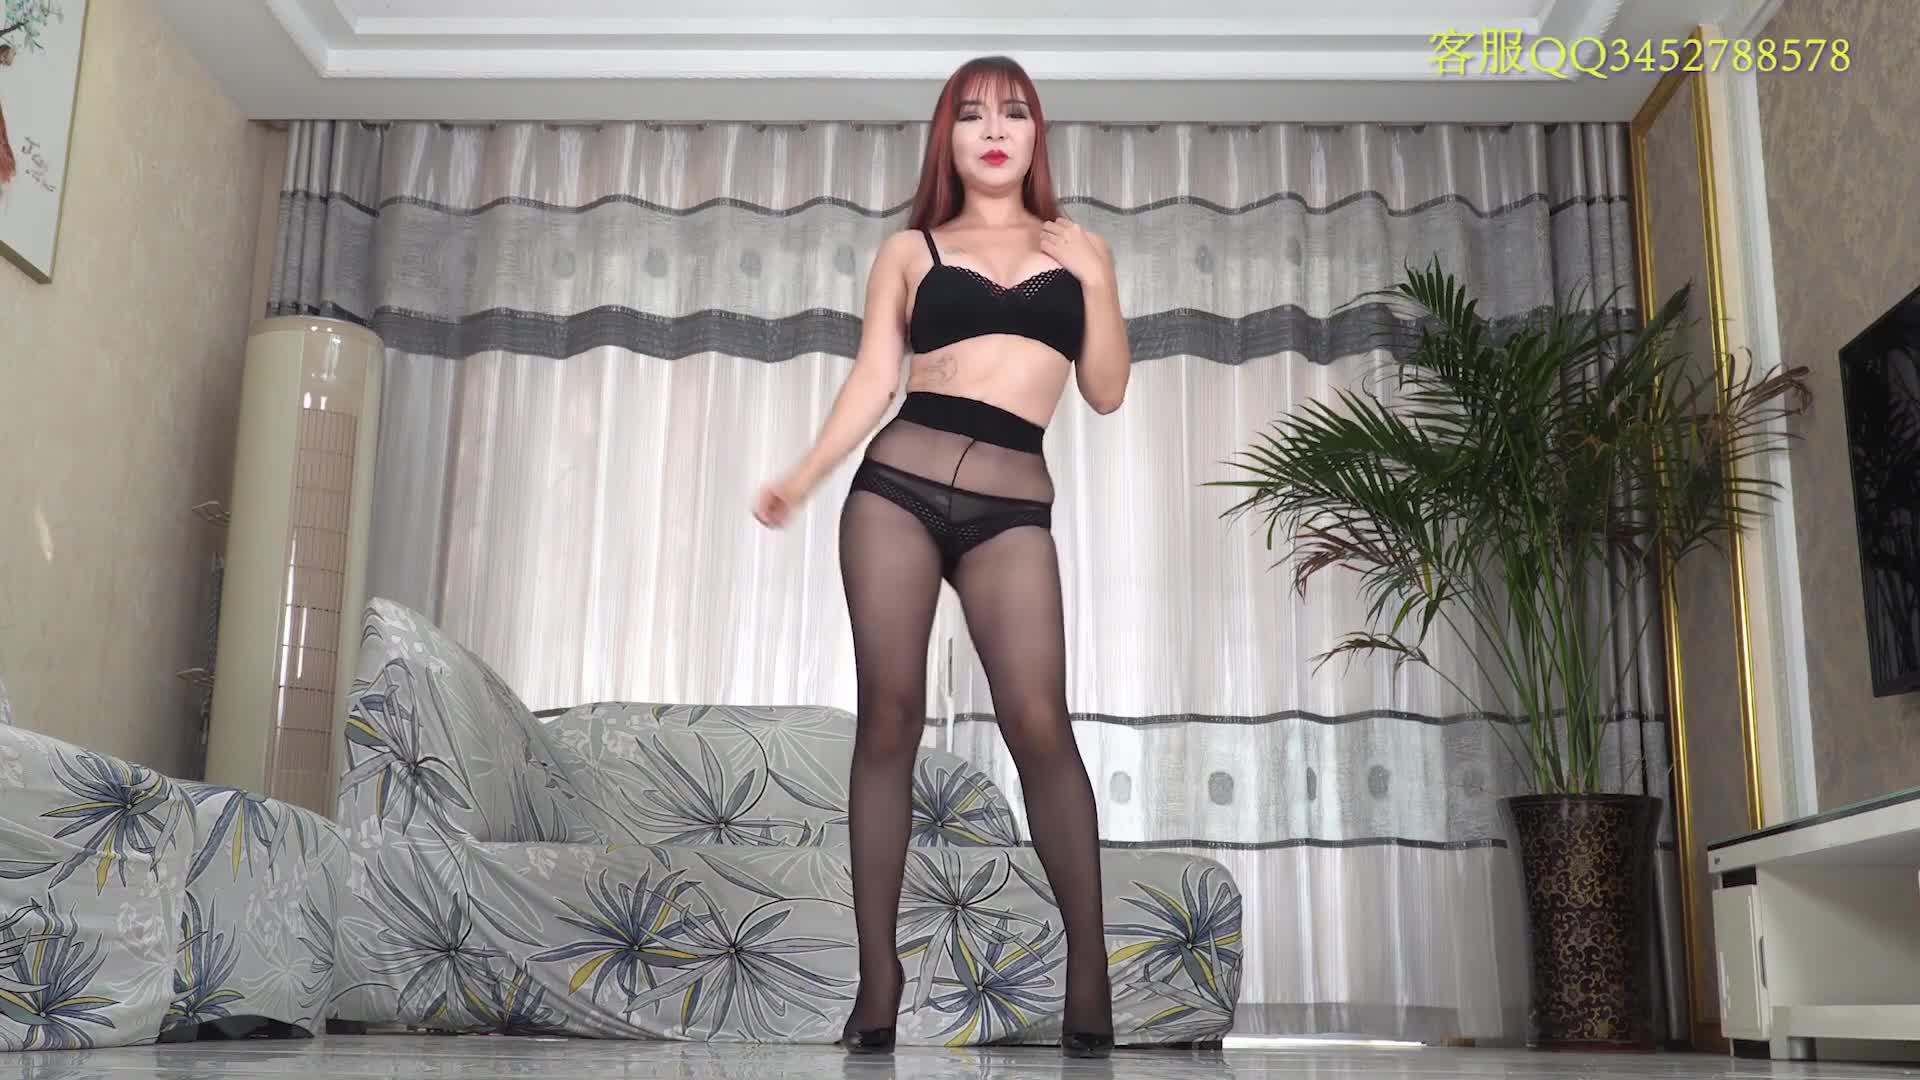 Sexy Dance 林夕 黑色絲襪+黑色蕾絲內衣 性感熟女激情誘惑熱舞(橫屏)